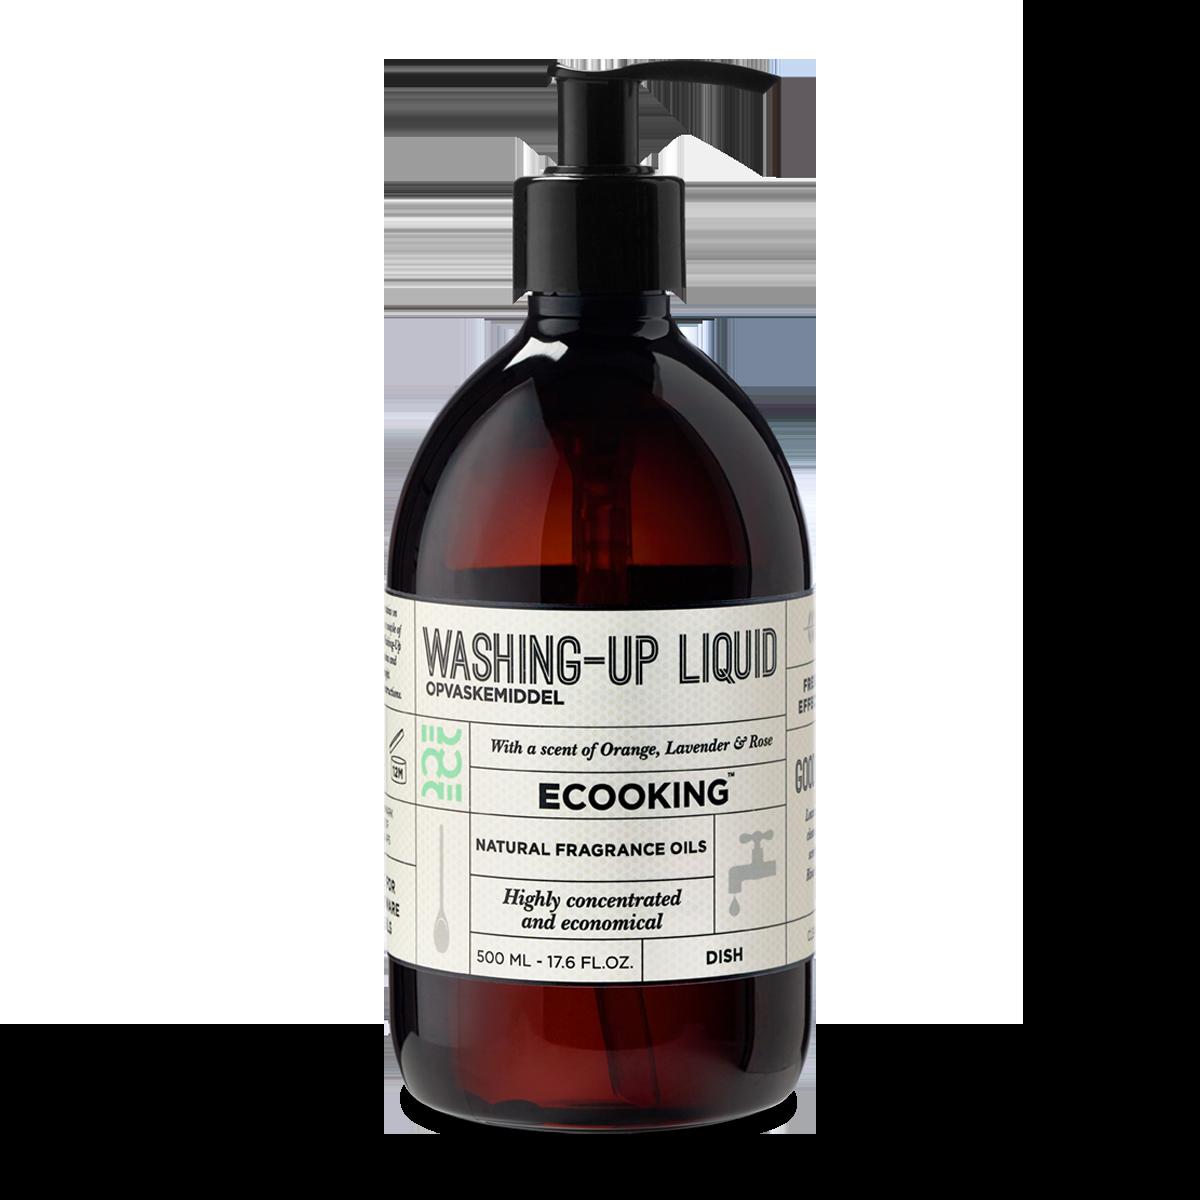 Washing-up Liquid 500 ml